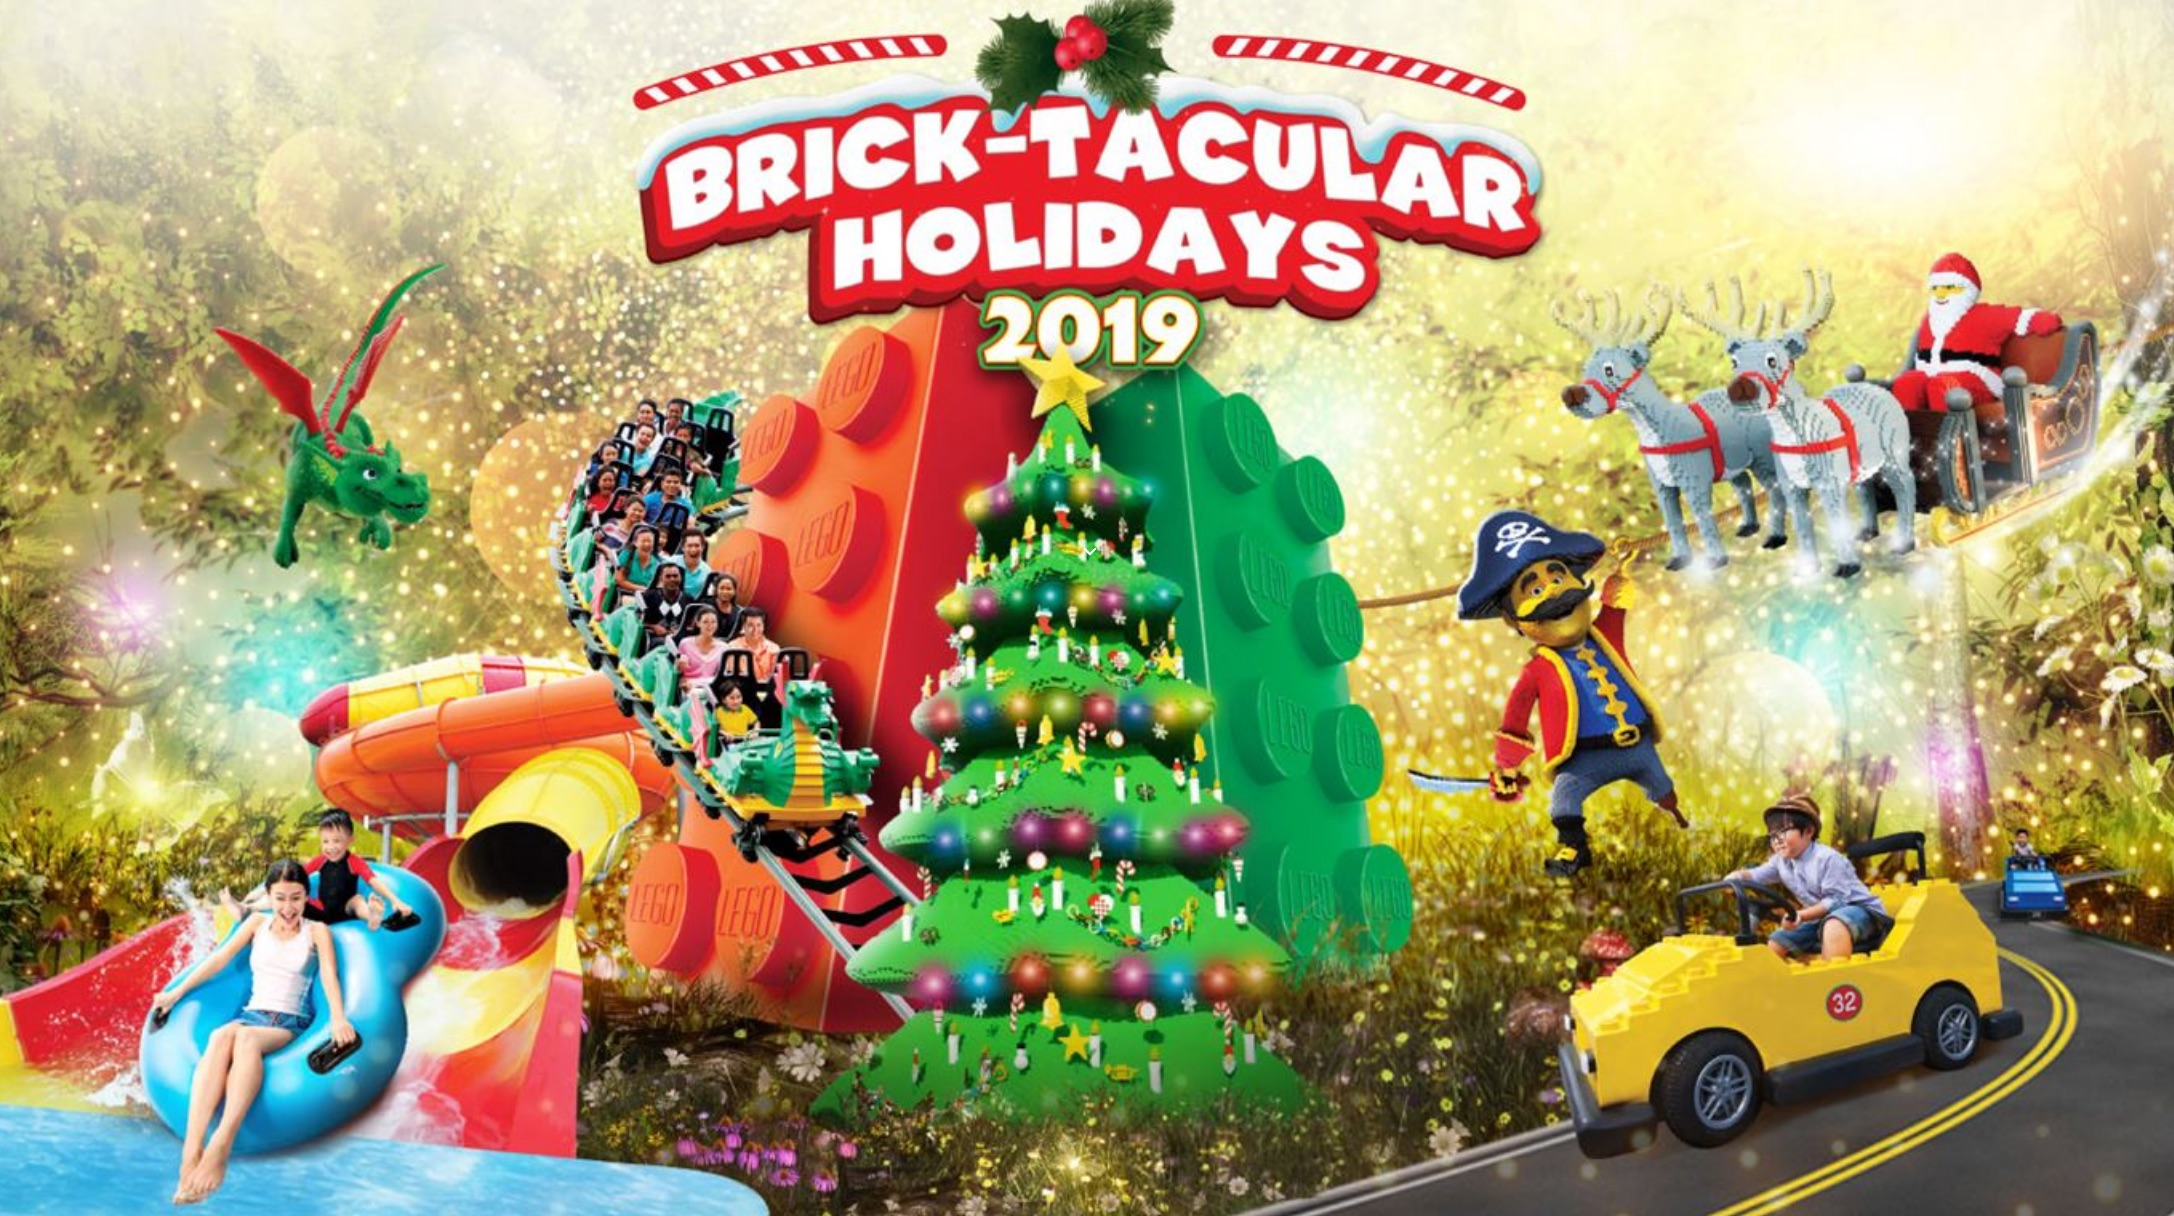 Enjoy a BRICK-tacluar Holiday at Legoland Malaysia - Alvinology